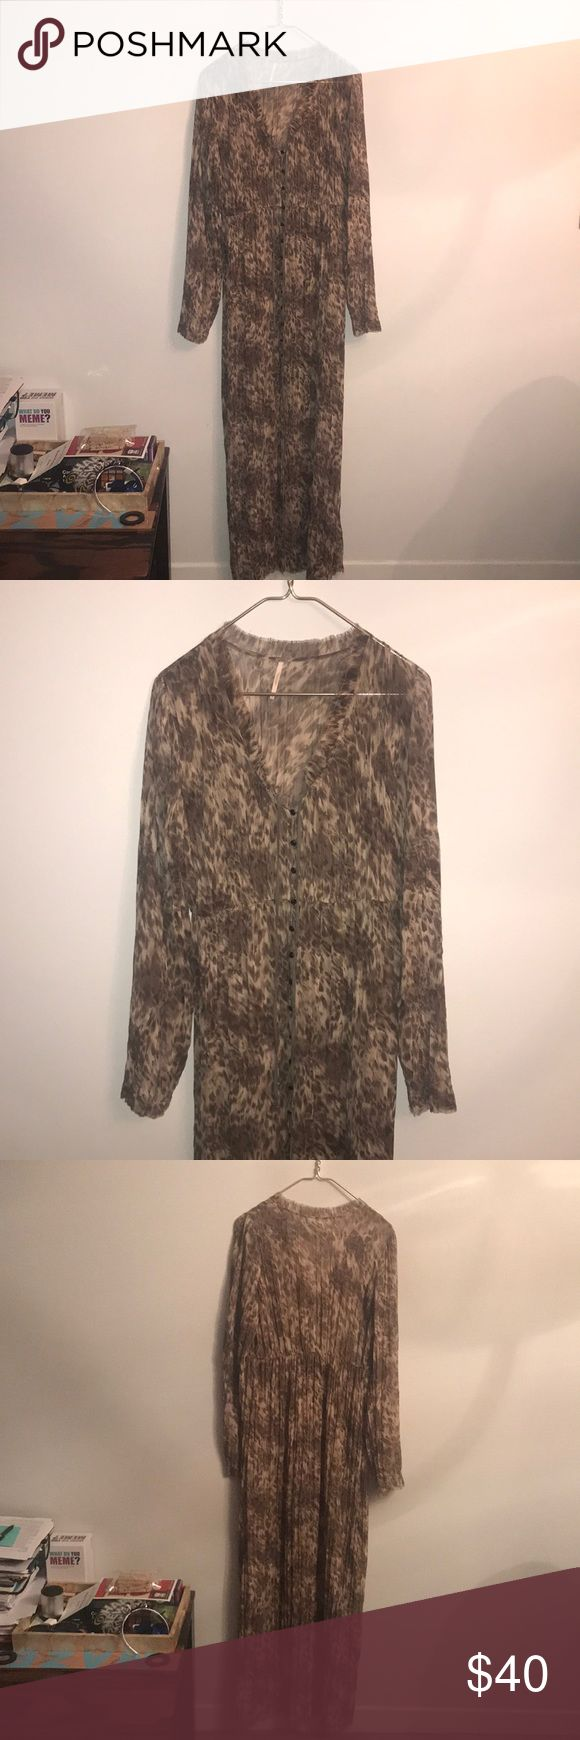 Free People maxi dress size large Worn 2 times - Free People leopard maxi dress - size large Free People Dresses Maxi